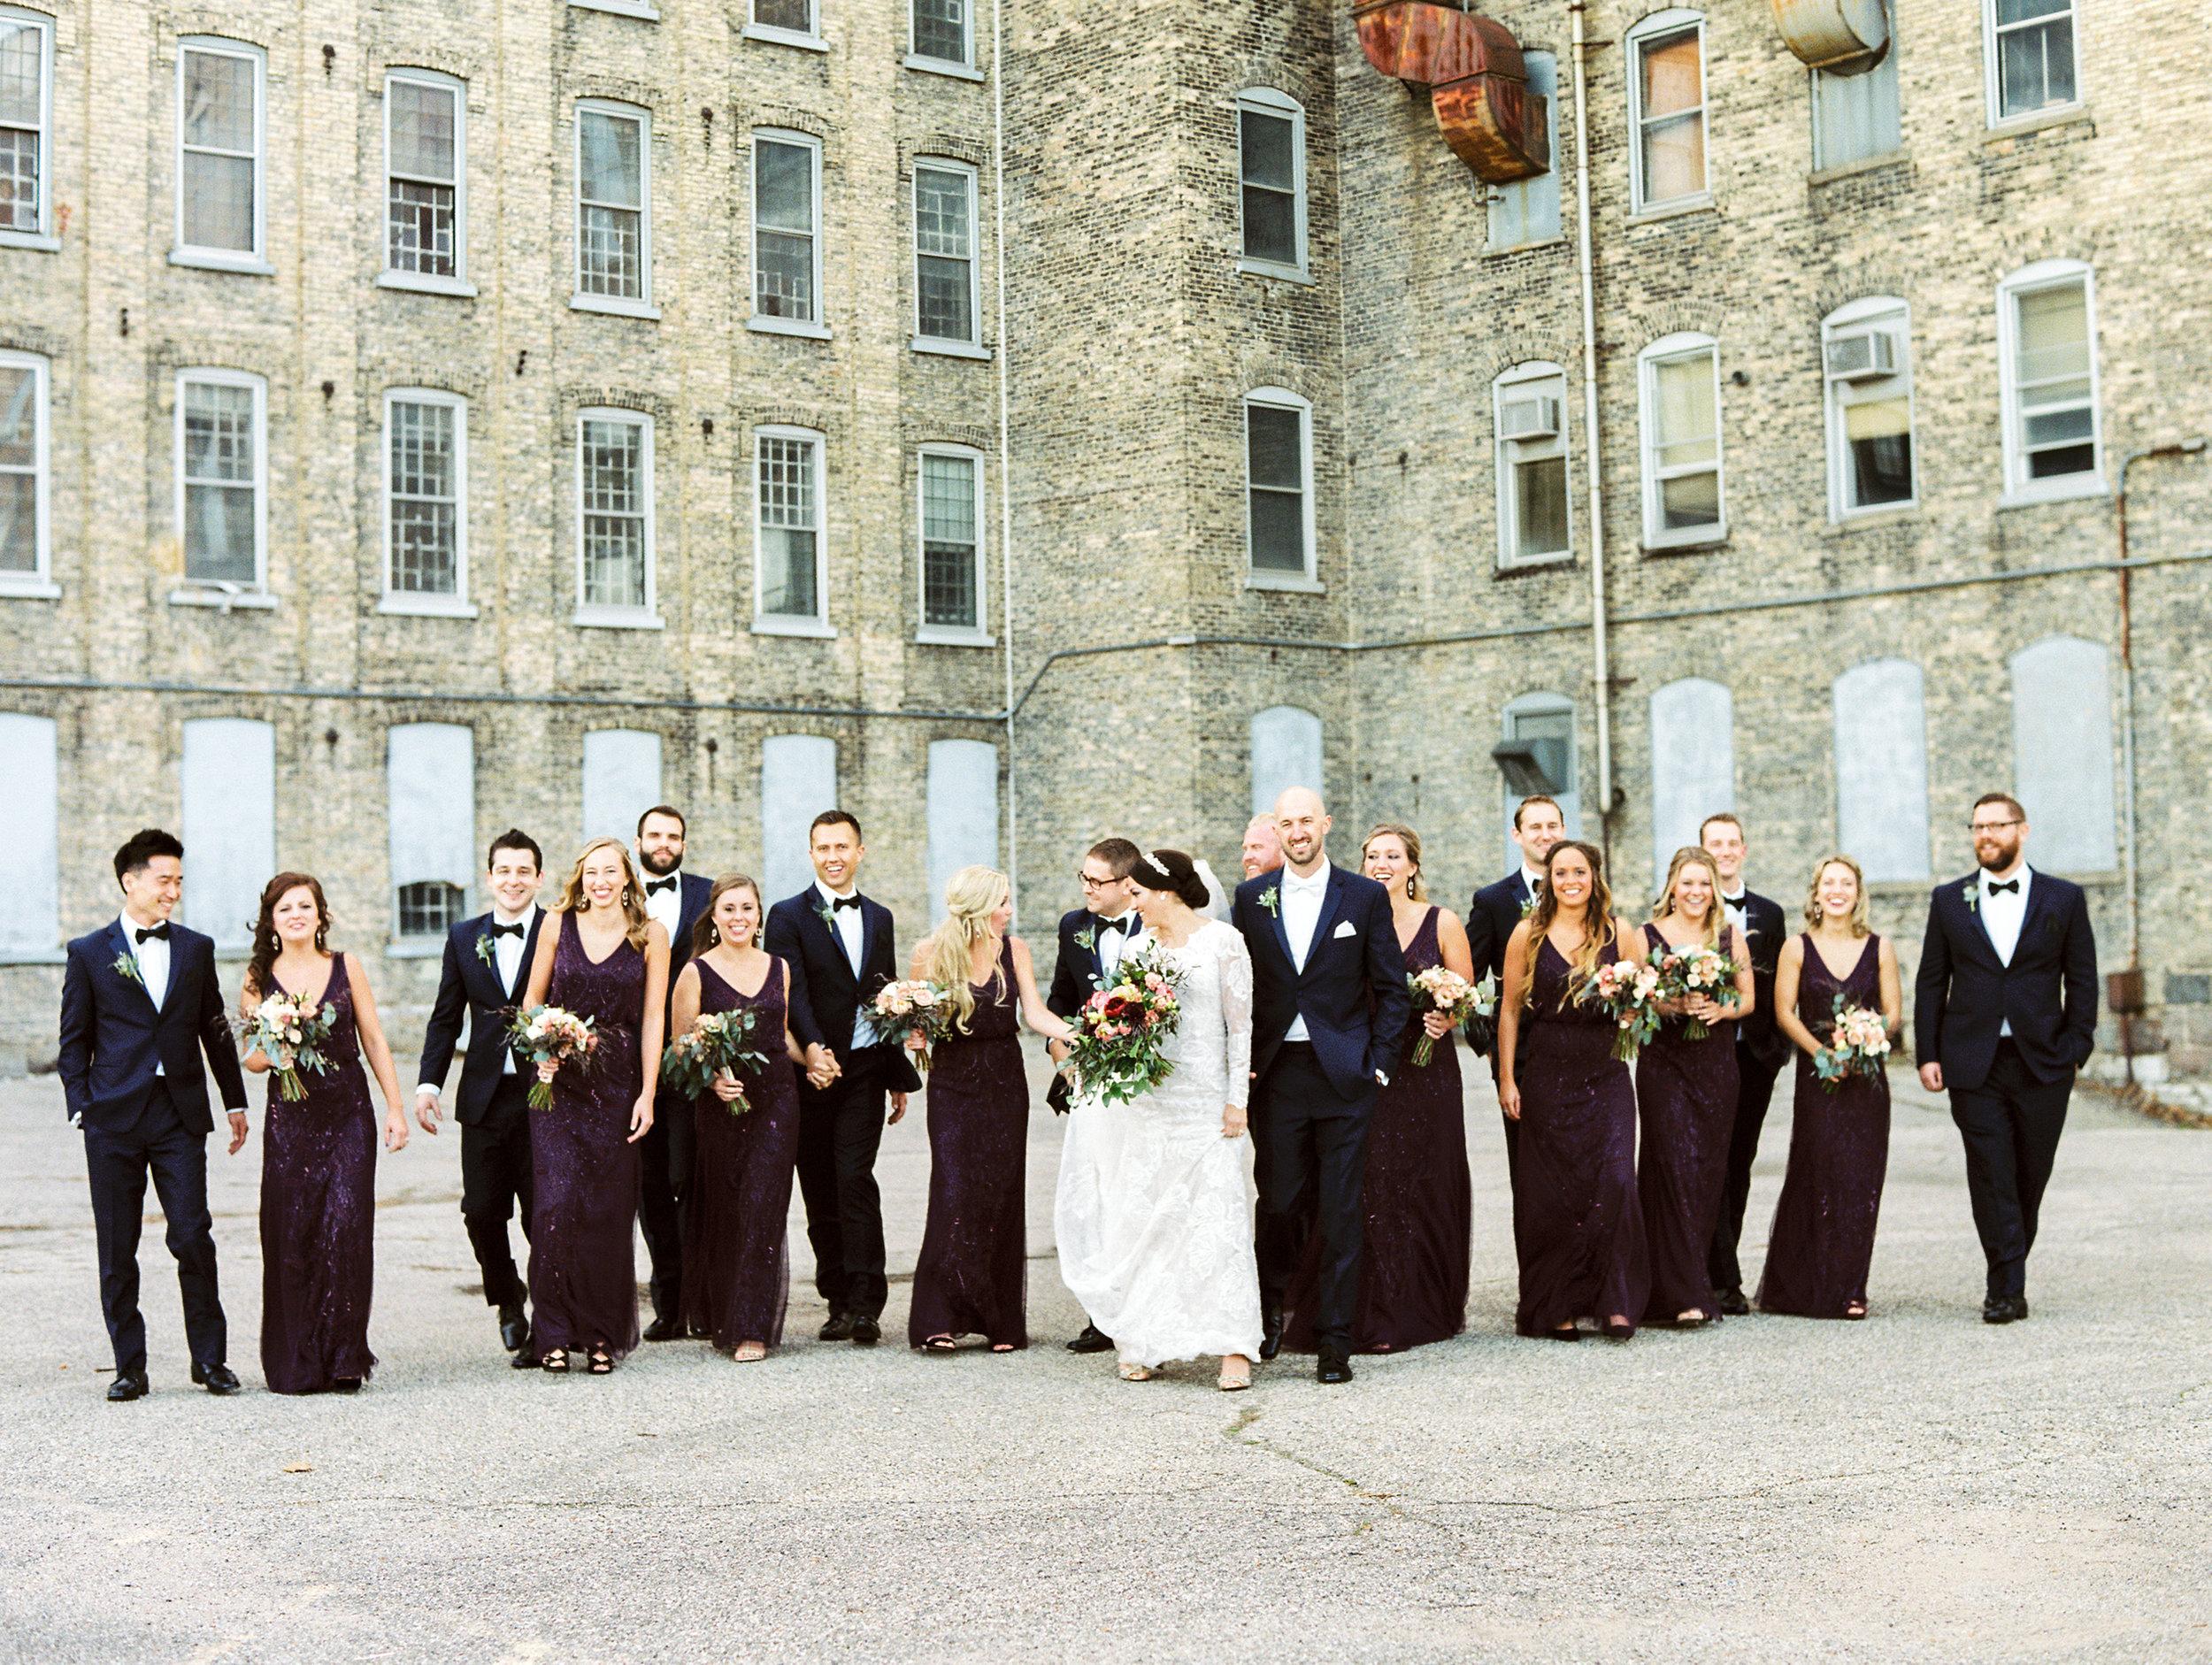 Vogelzang+Wedding+Bridal+Party-55.jpg